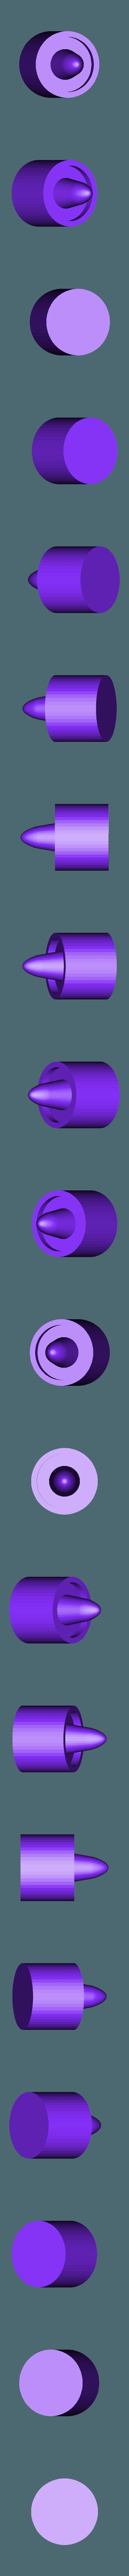 Nose.stl Download free STL file 1989 mini Batmobile • 3D printable model, Dsk